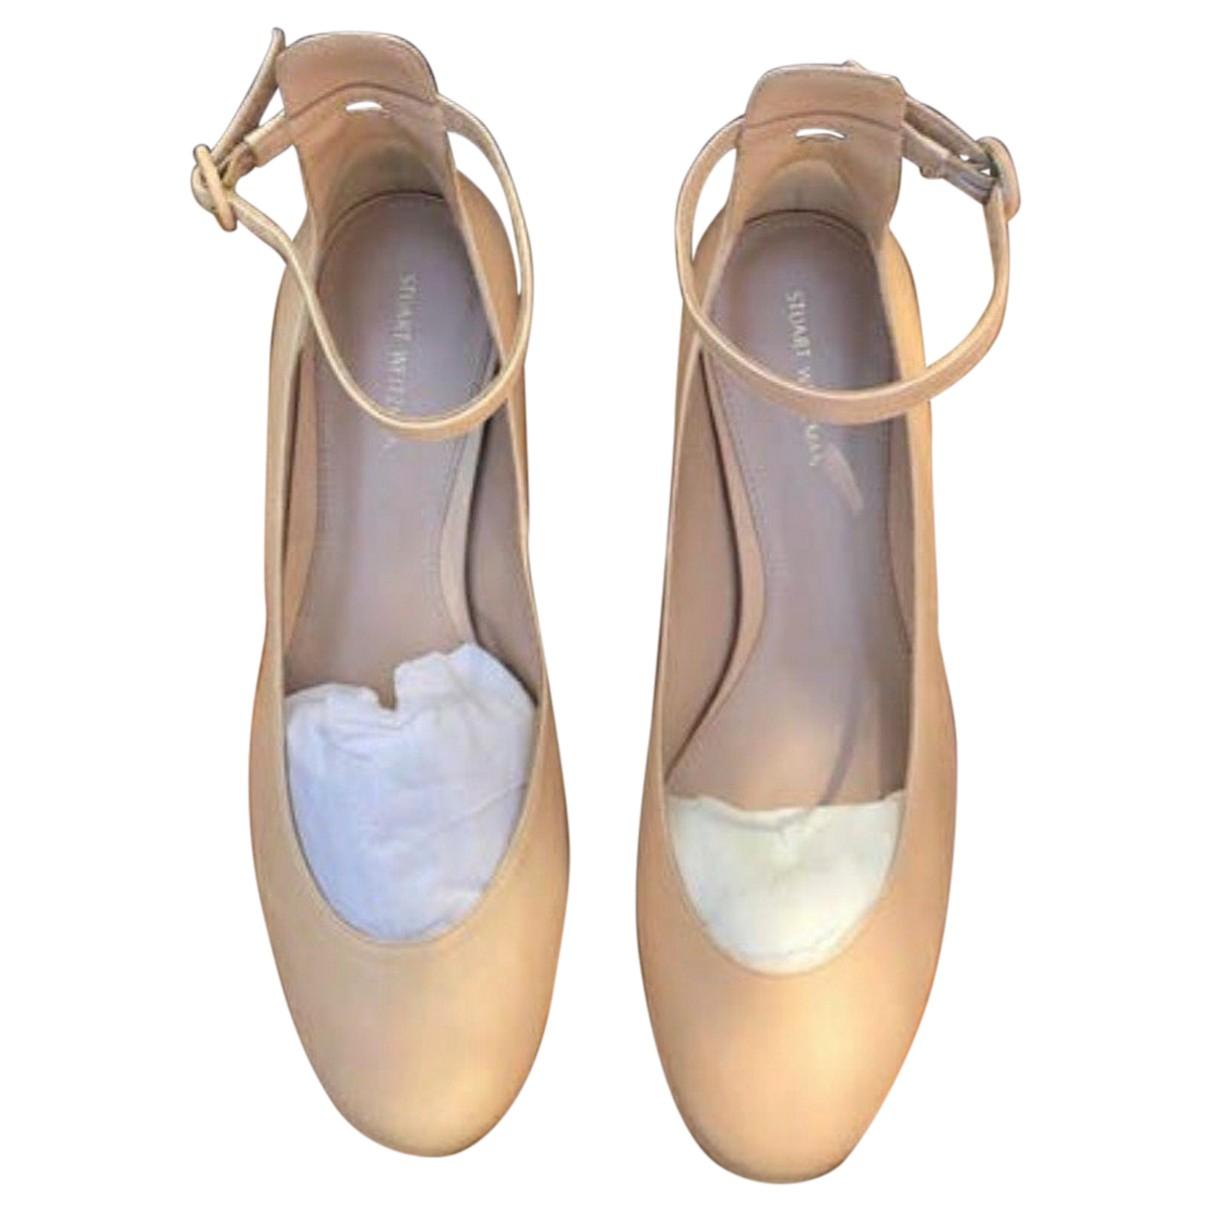 Stuart Weitzman N Ecru Fur Ballet flats for Women 38 EU